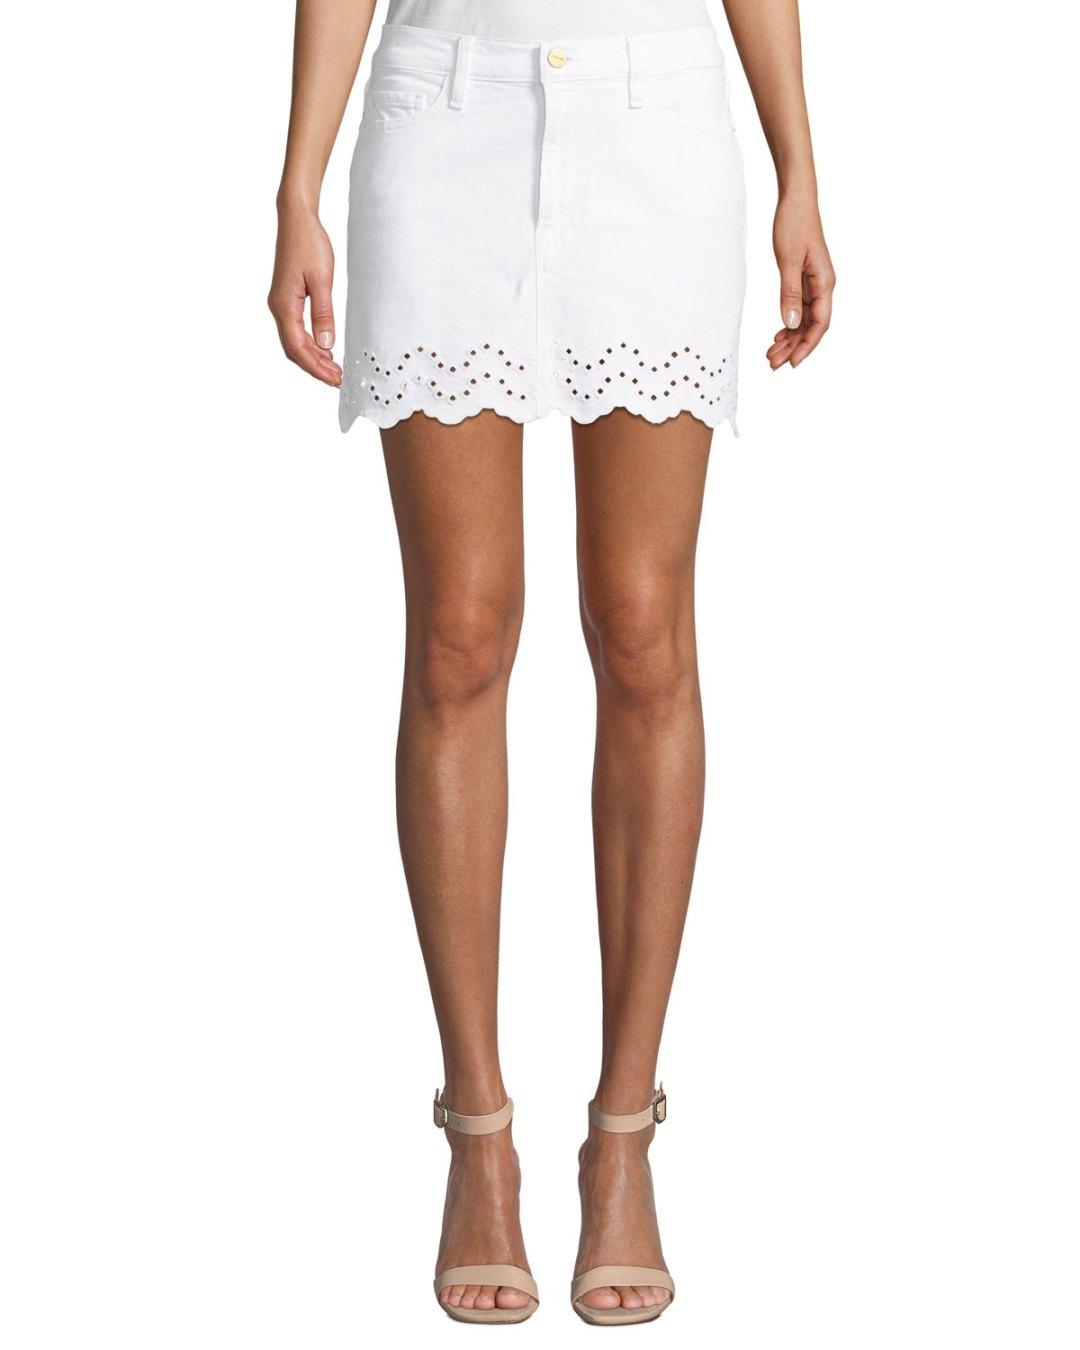 196af0e0afd Neiman Marcus – Schiffly Scalloped Eyelet Mini Skirt –  205.00